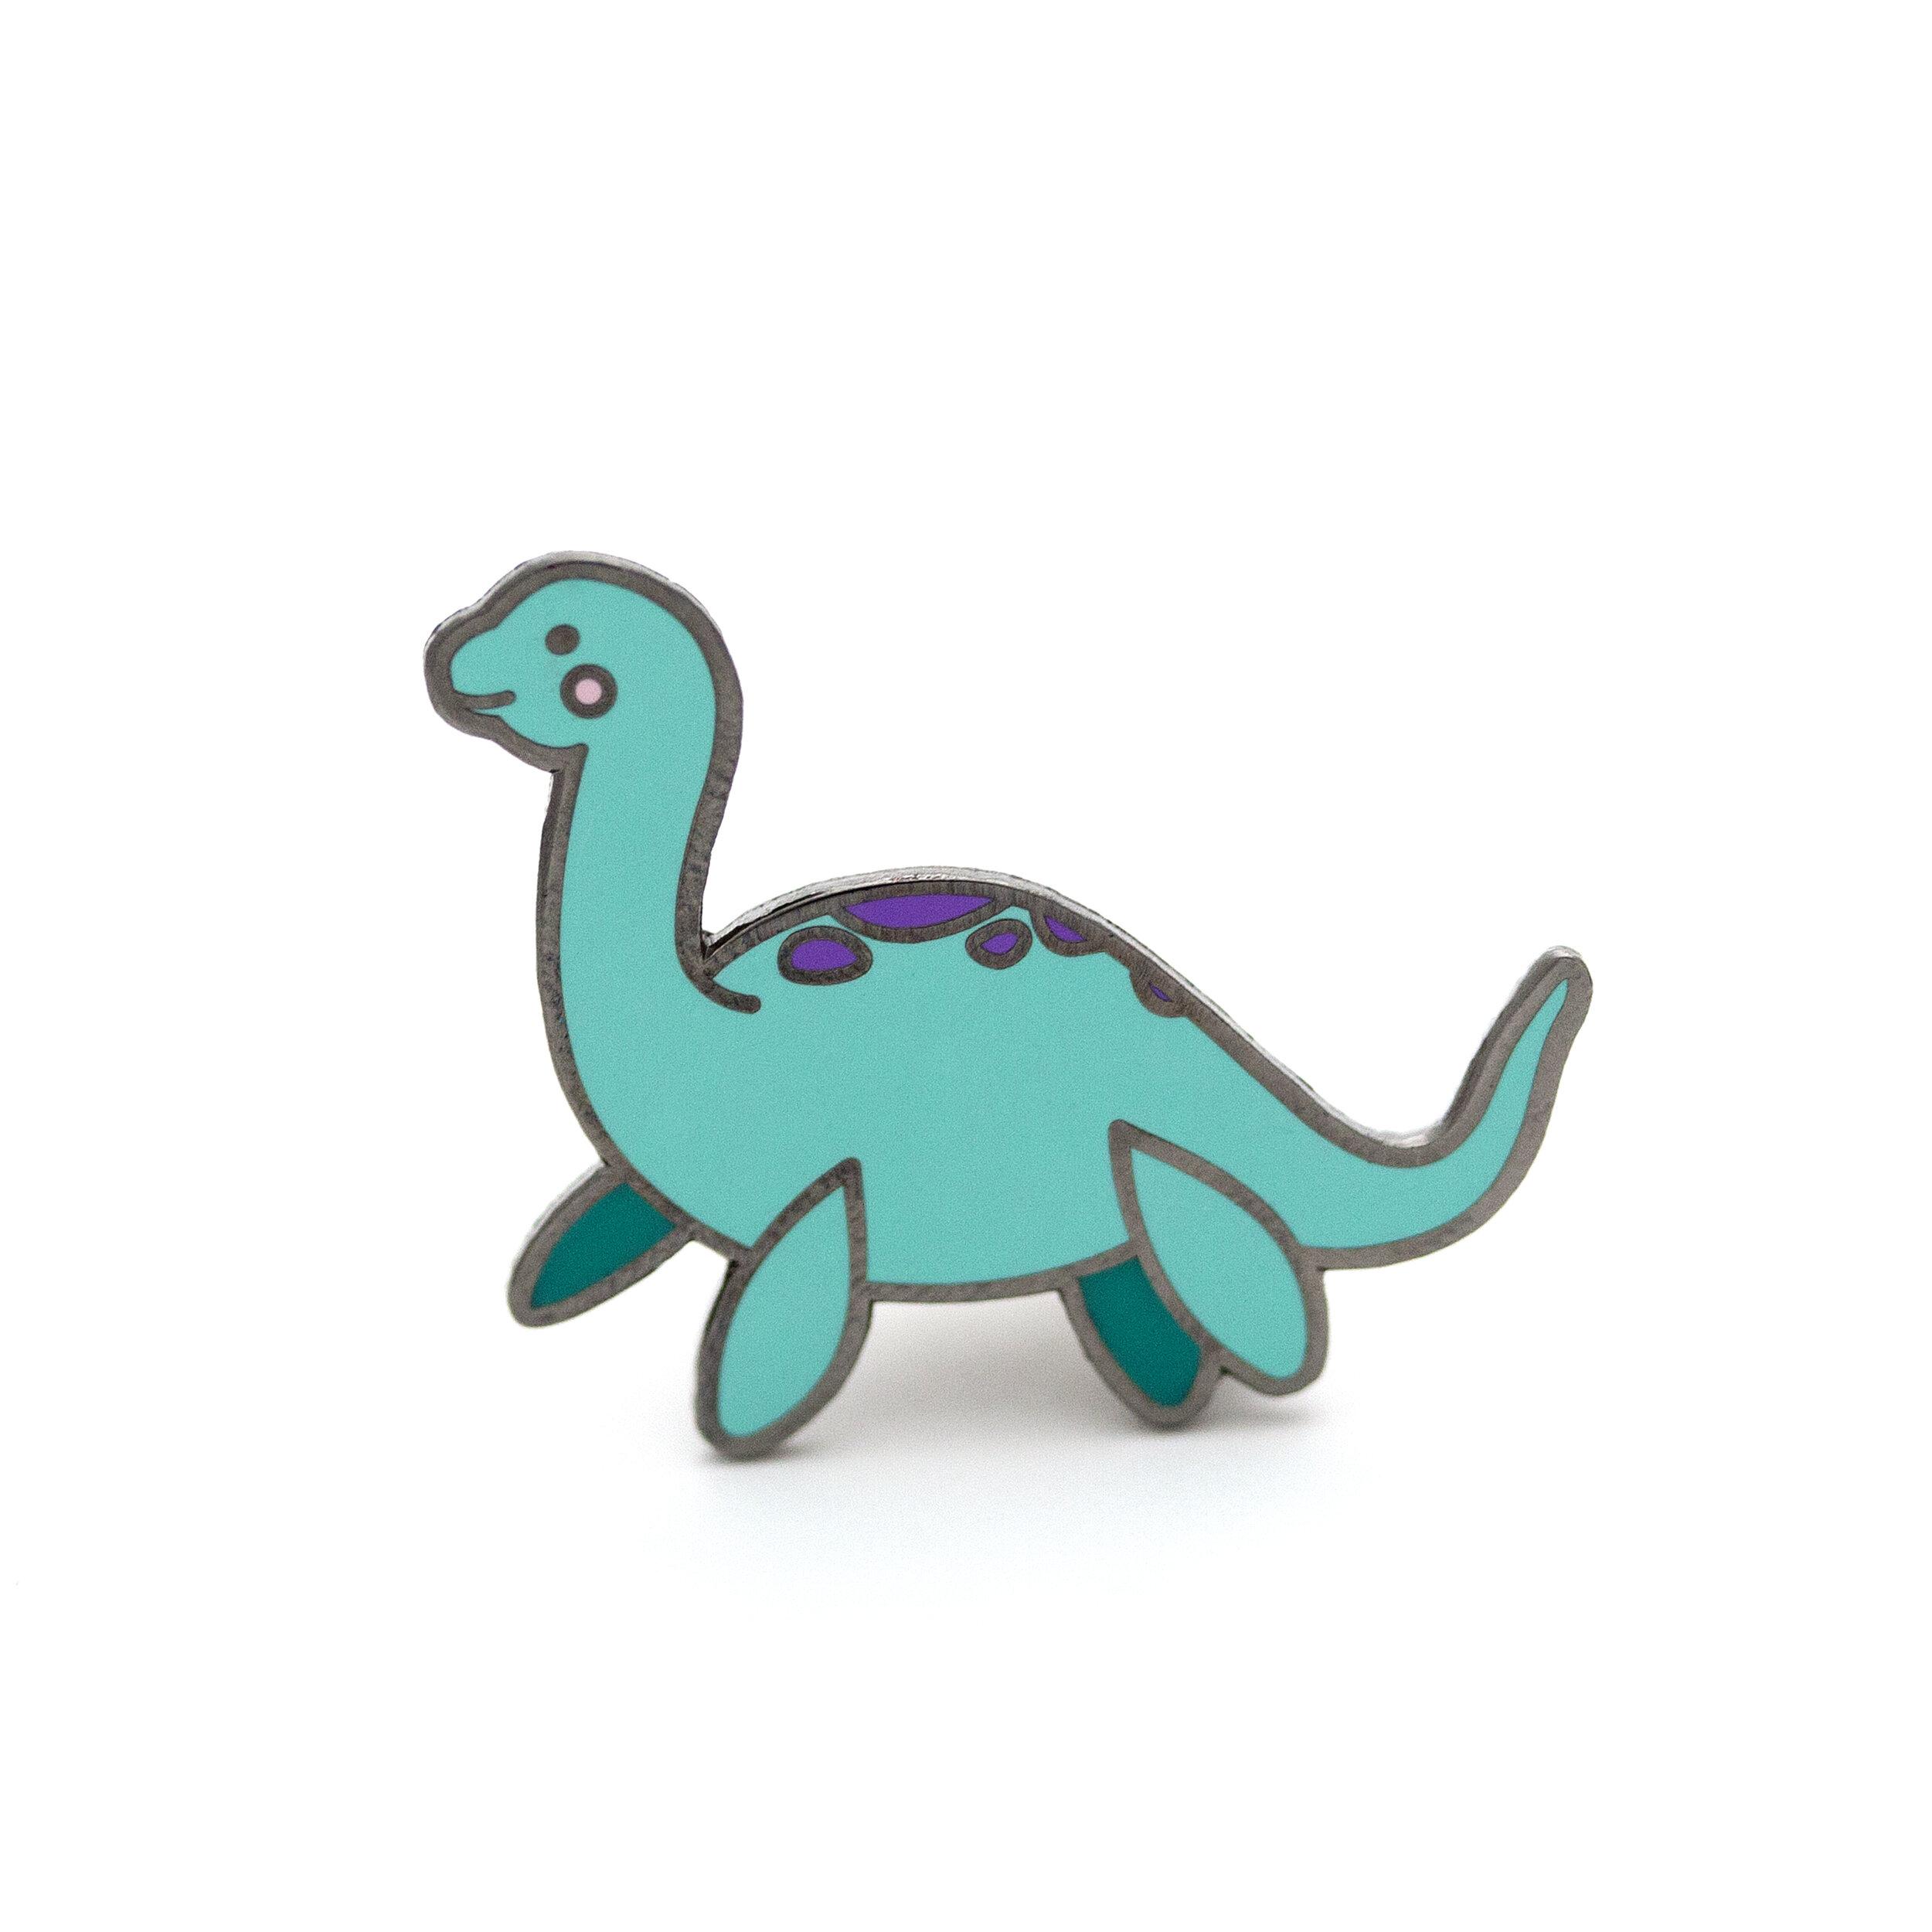 P1 - Lady Loch Ness Pin